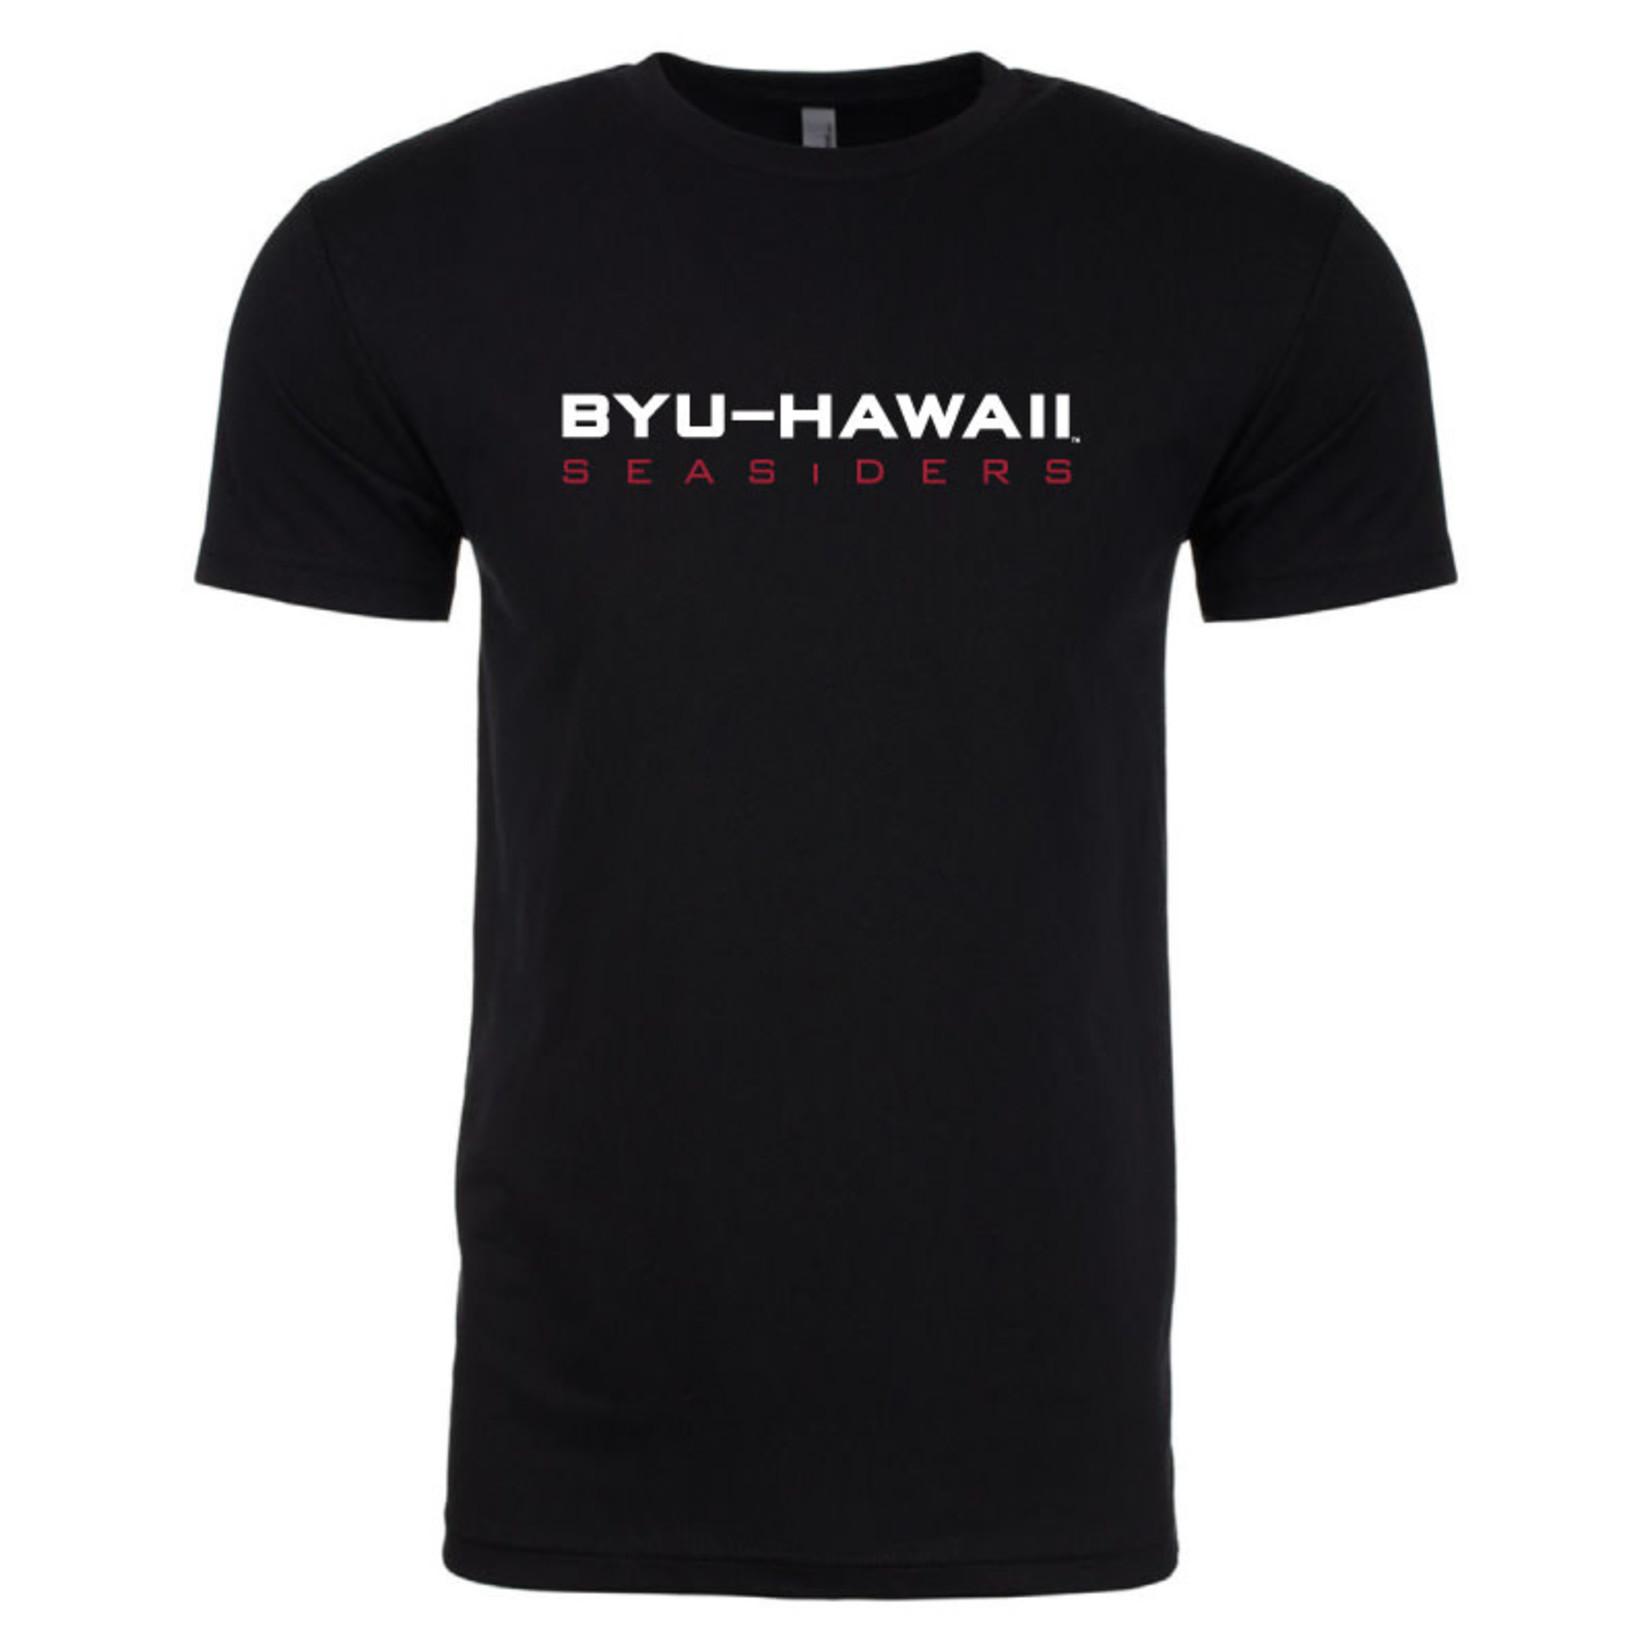 BYU-Hawaii Stacked & Widened - CVC